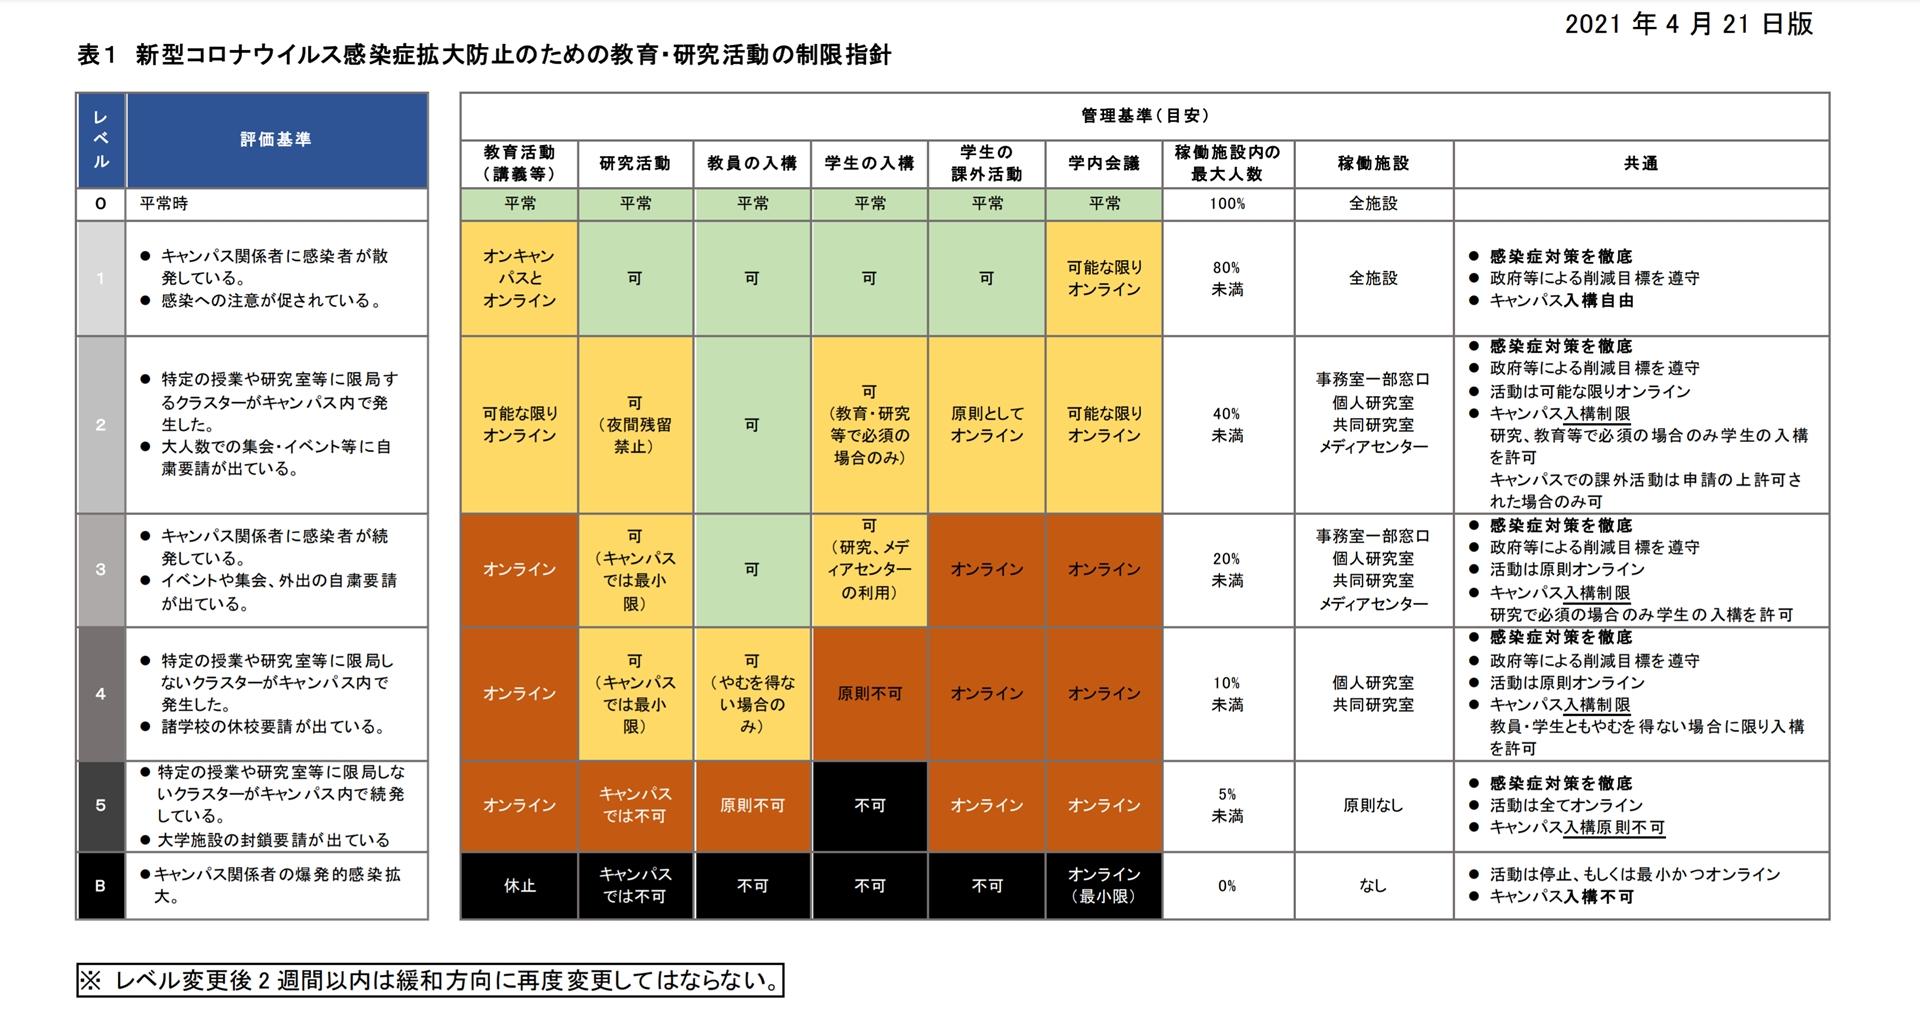 SFCの活動制限レベル一覧(公式サイトより引用)